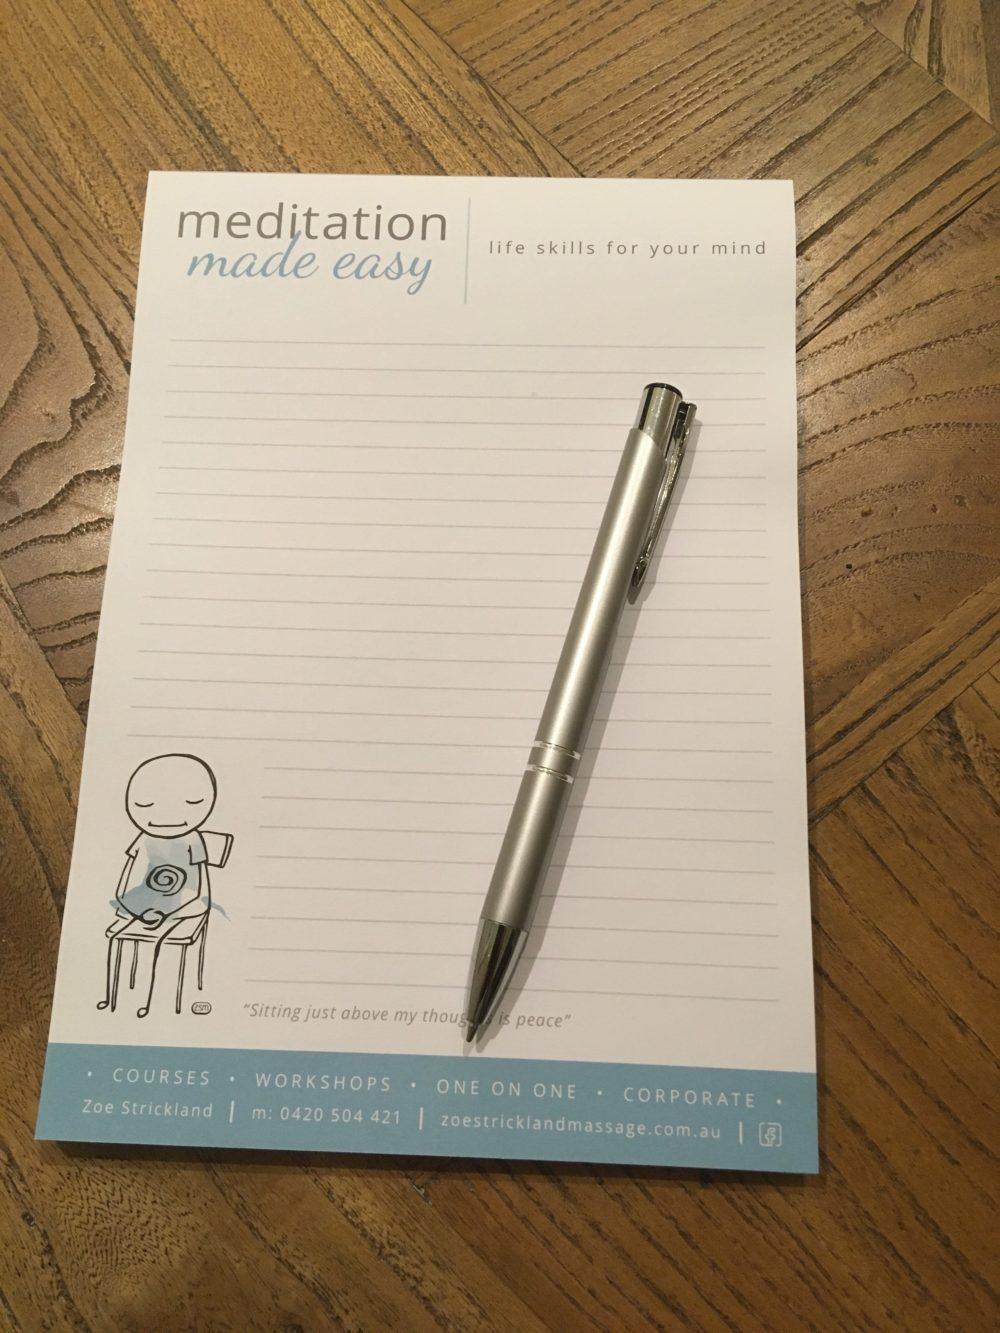 meditation-made-easy